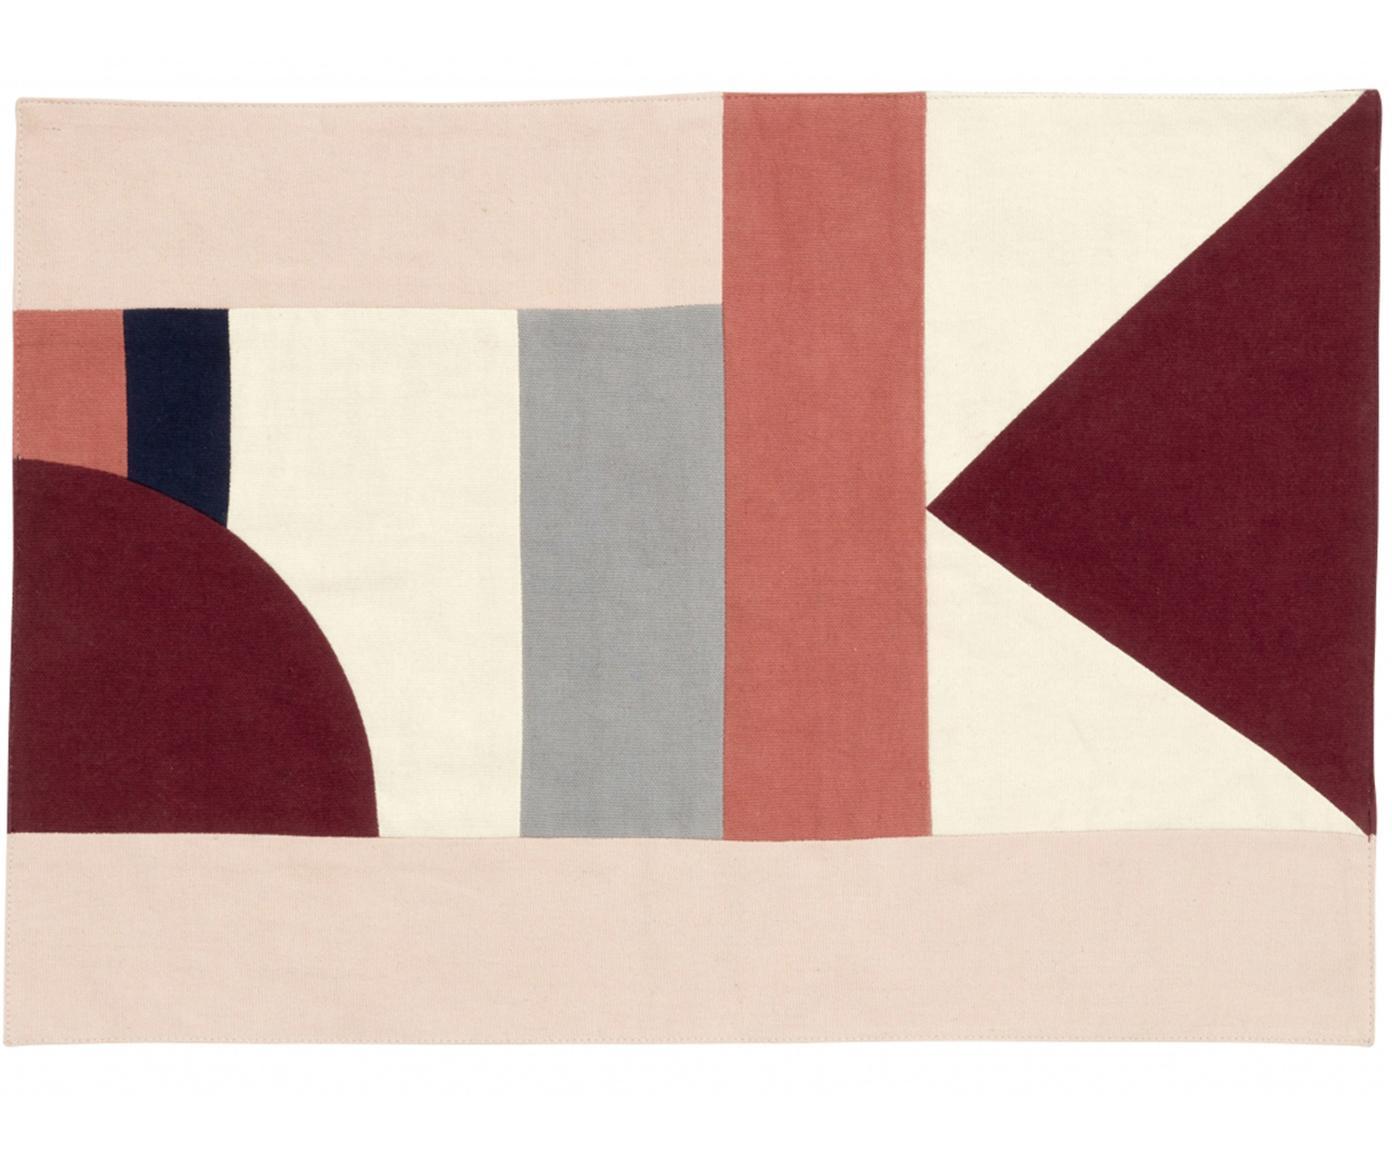 Manteles individuales Patchwork, 2uds., Algodón, Tonos rojos, tonos beige, negro, An 48 x L 0 cm